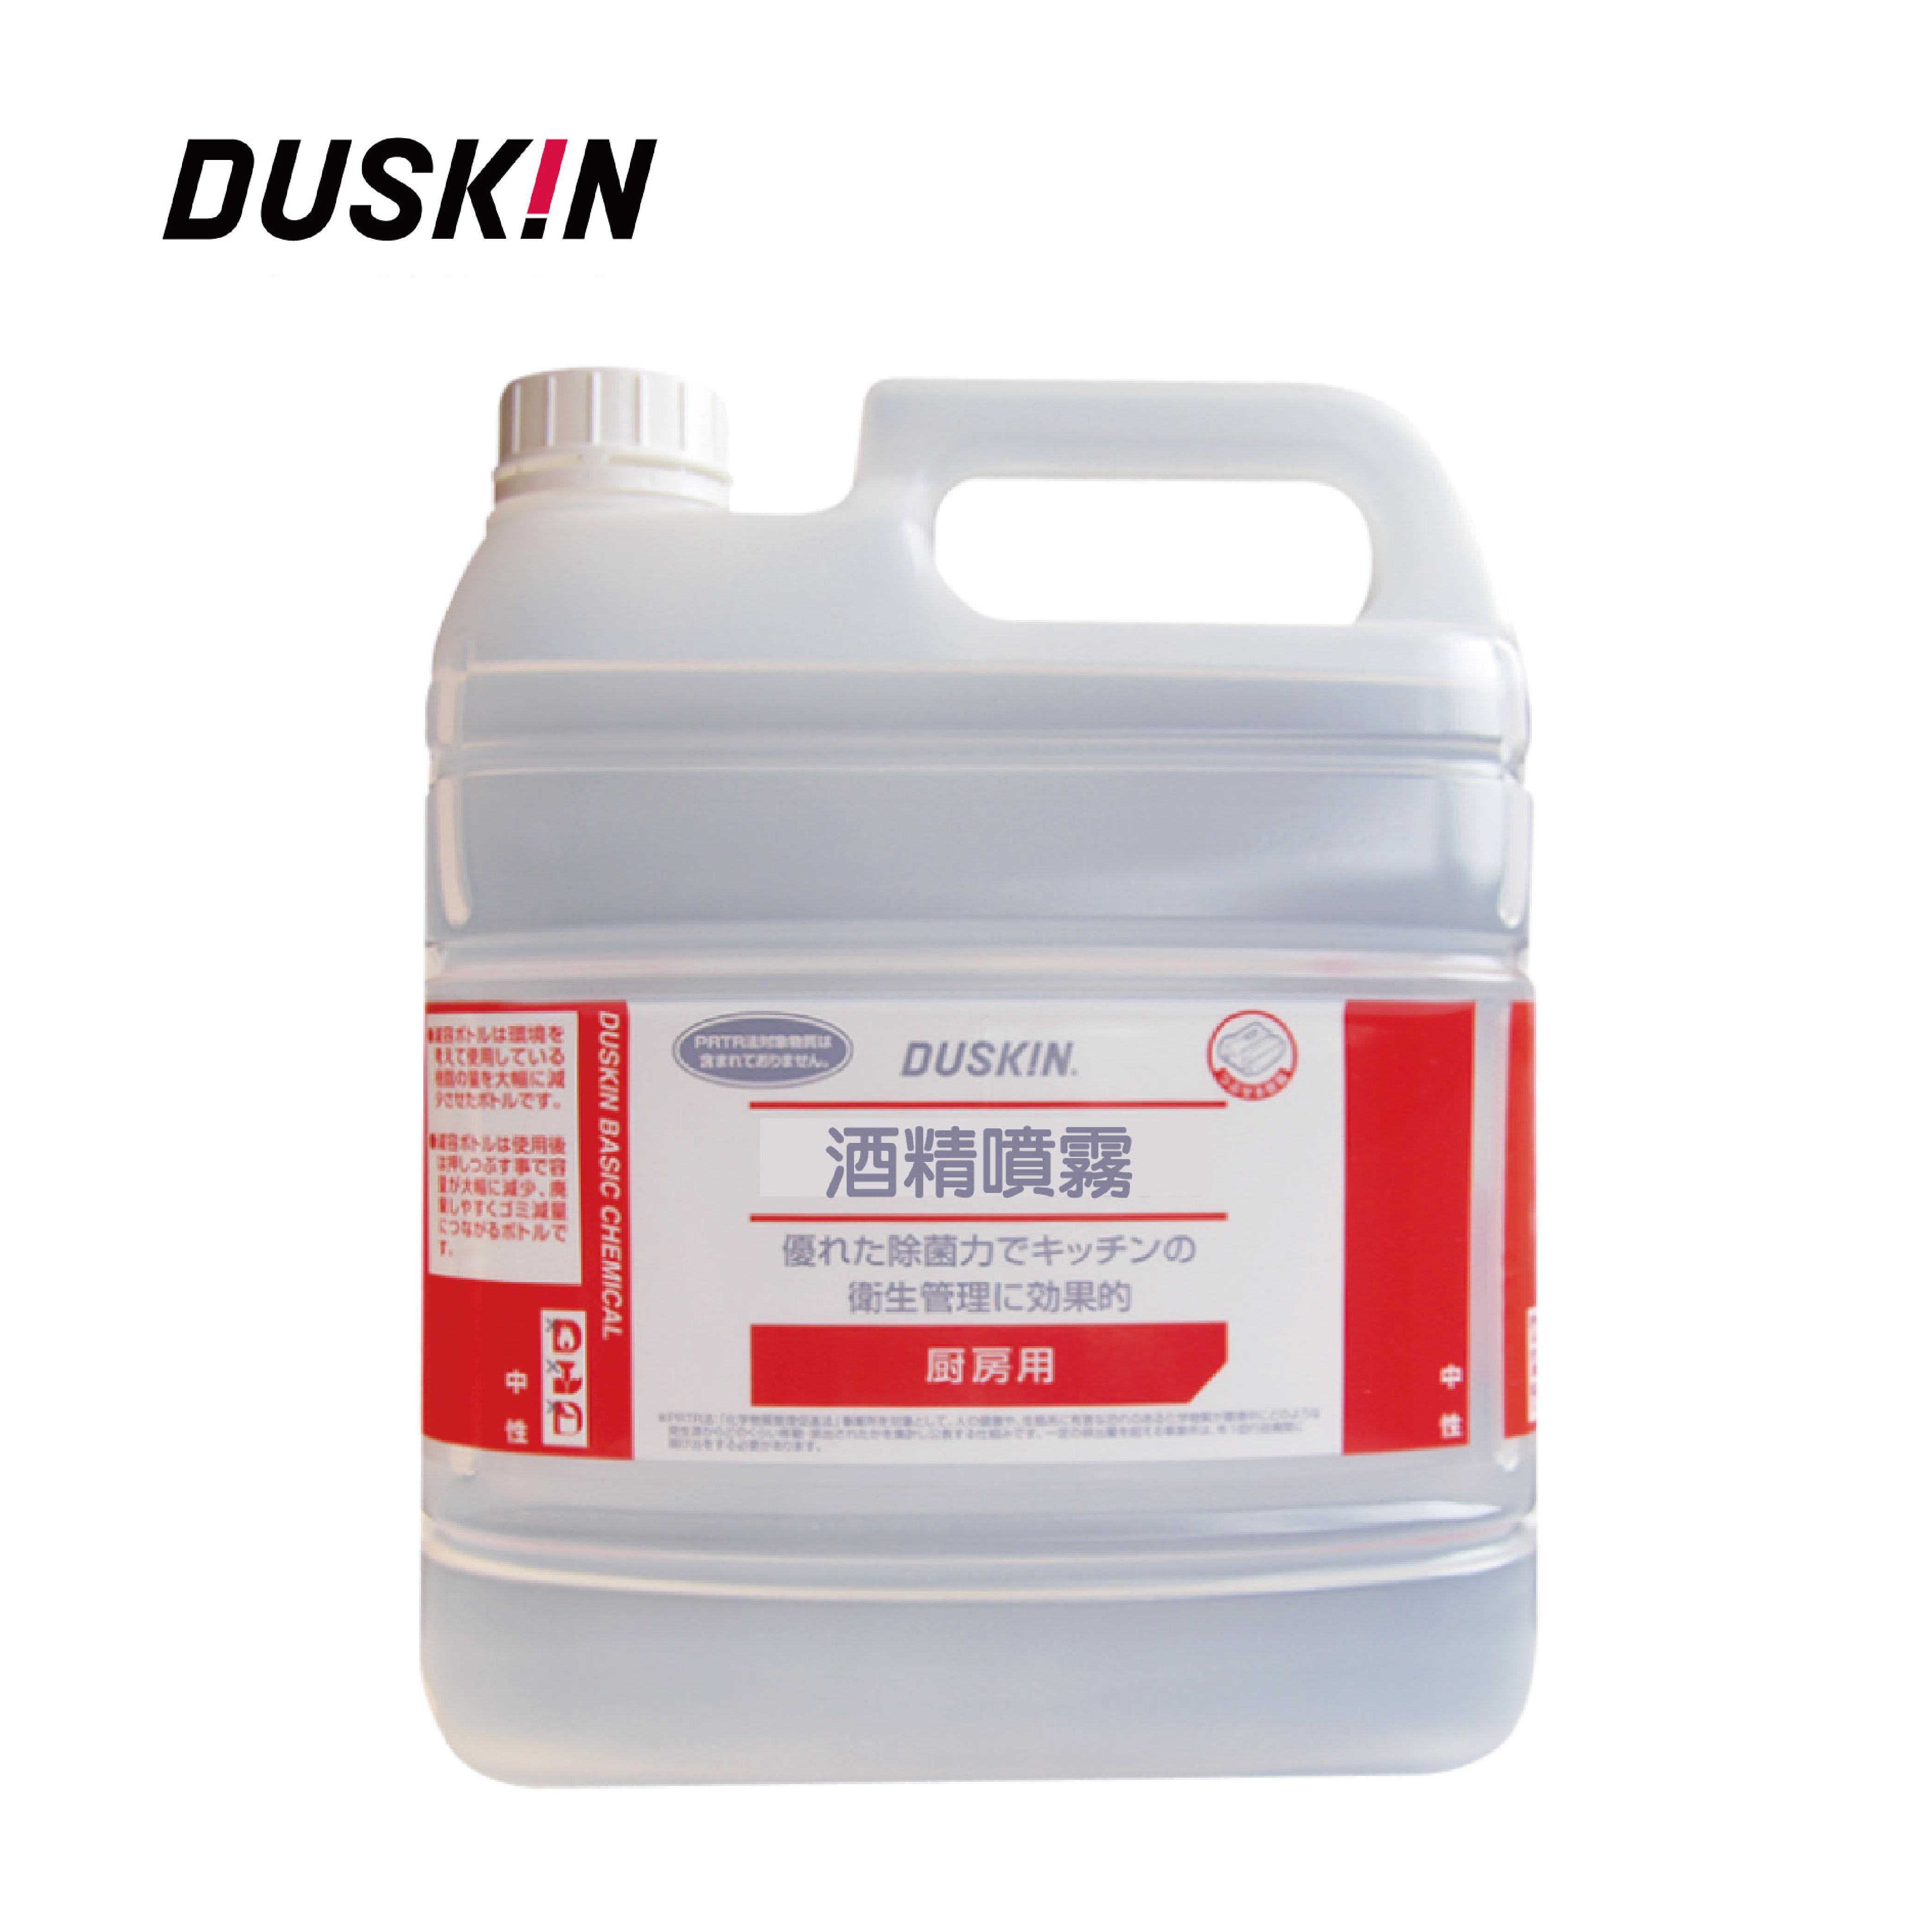 DUSKIN 酒精噴霧4L 日本原裝釀造用酒精安心使用 居家防疫必備 0